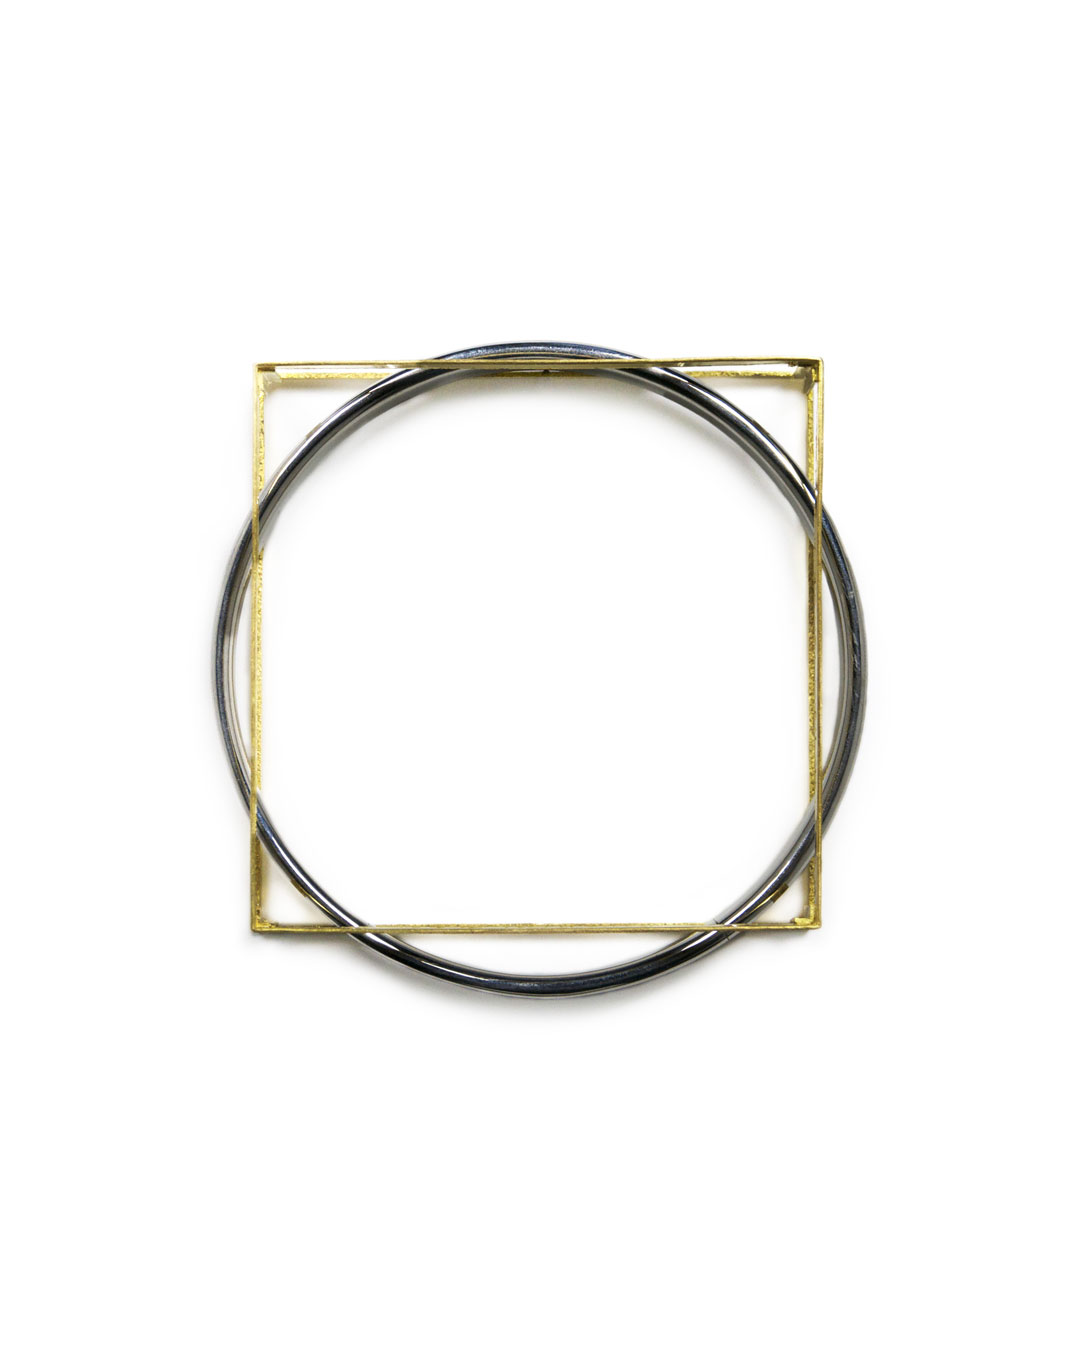 Okinari Kurokawa, untitled, 2012, bracelet; 20ct gold, stainless steel, 83 x 83 x 20 mm, €4800